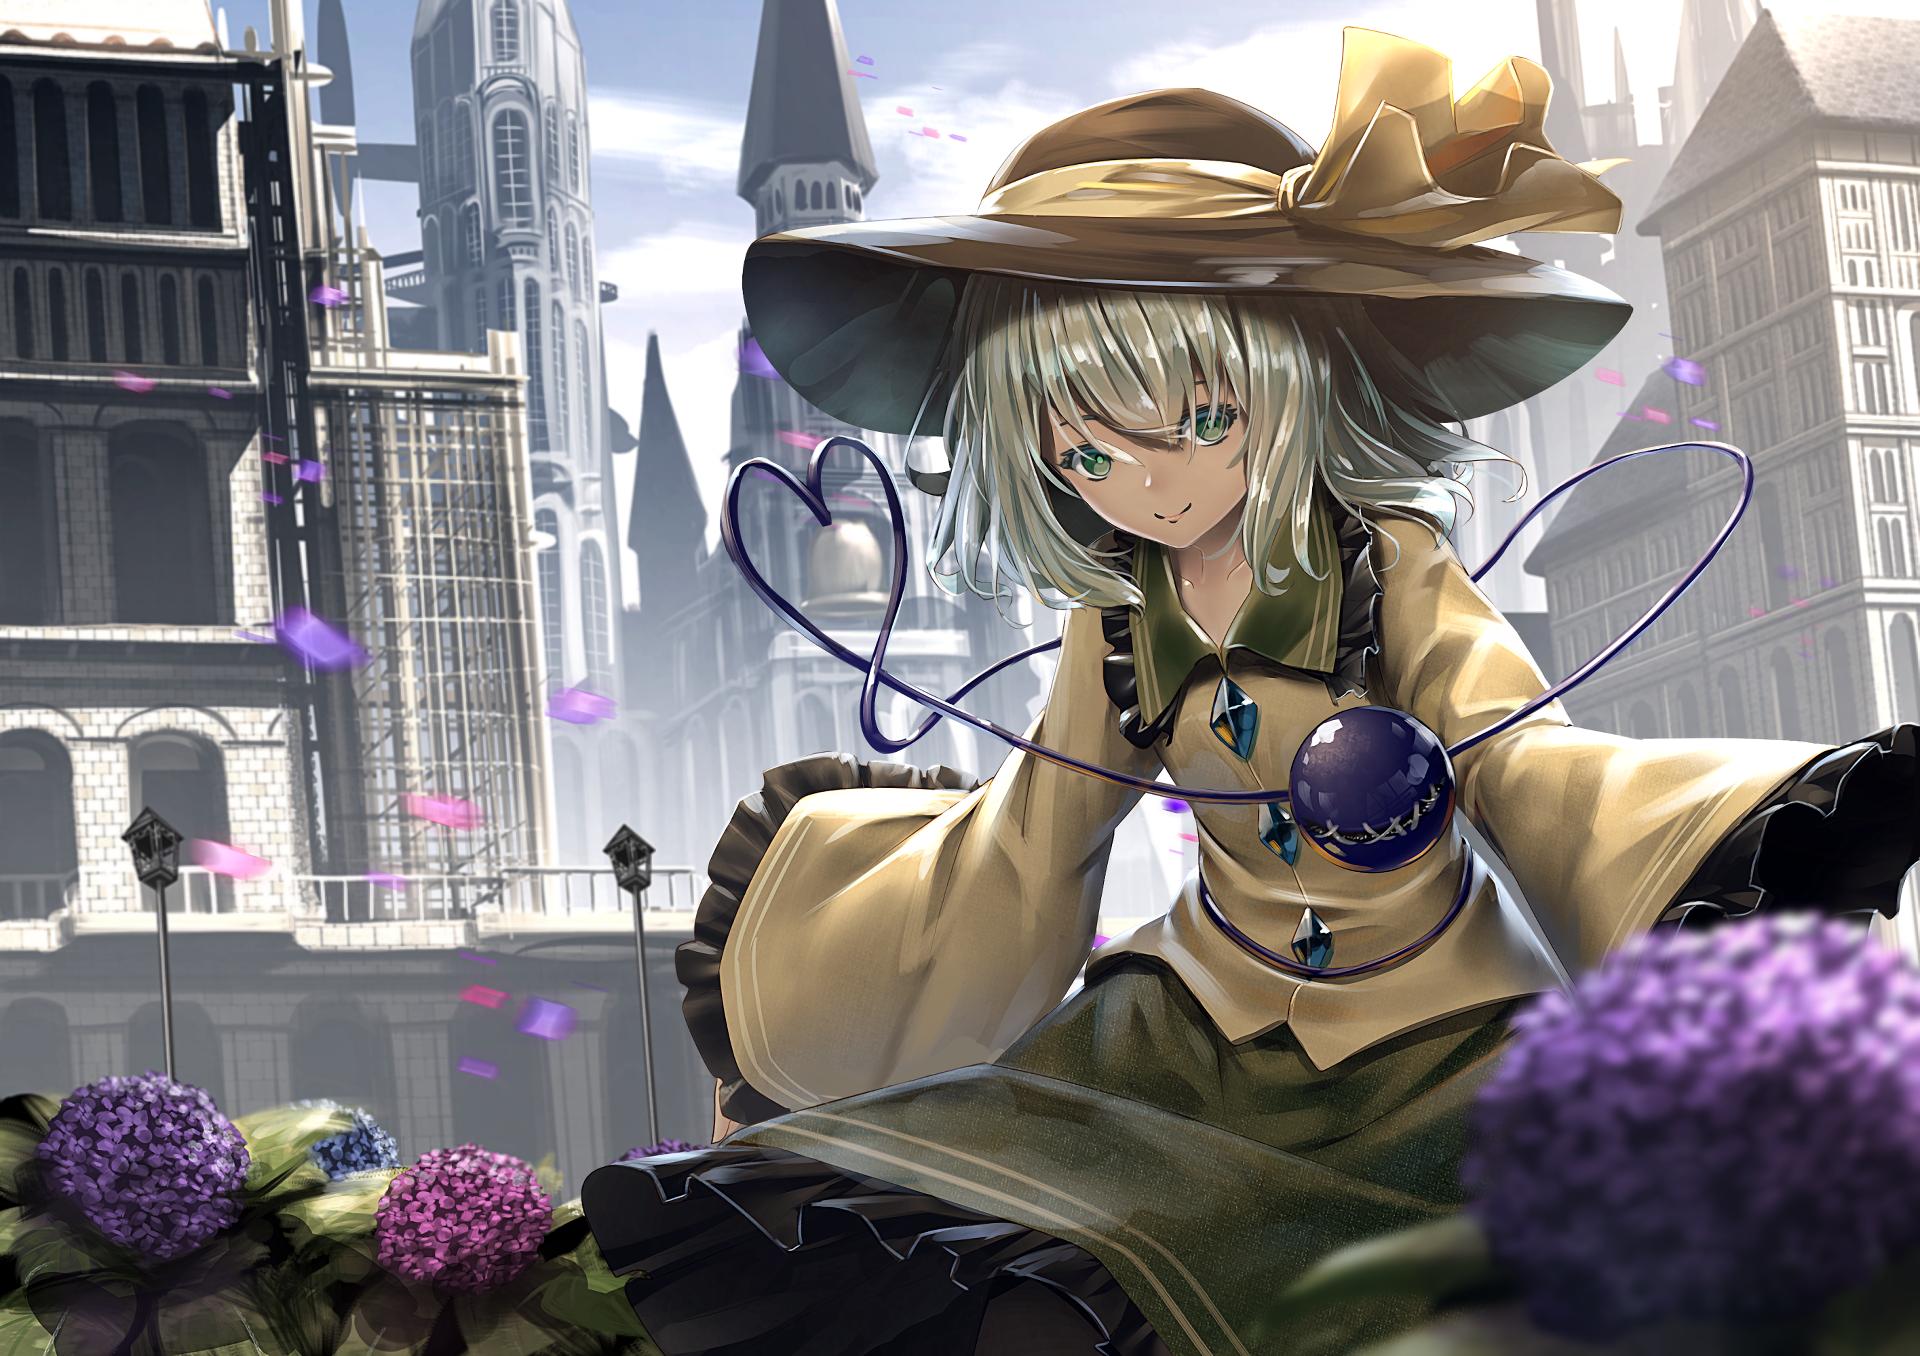 Anime - Touhou  Koishi Komeiji Wallpaper